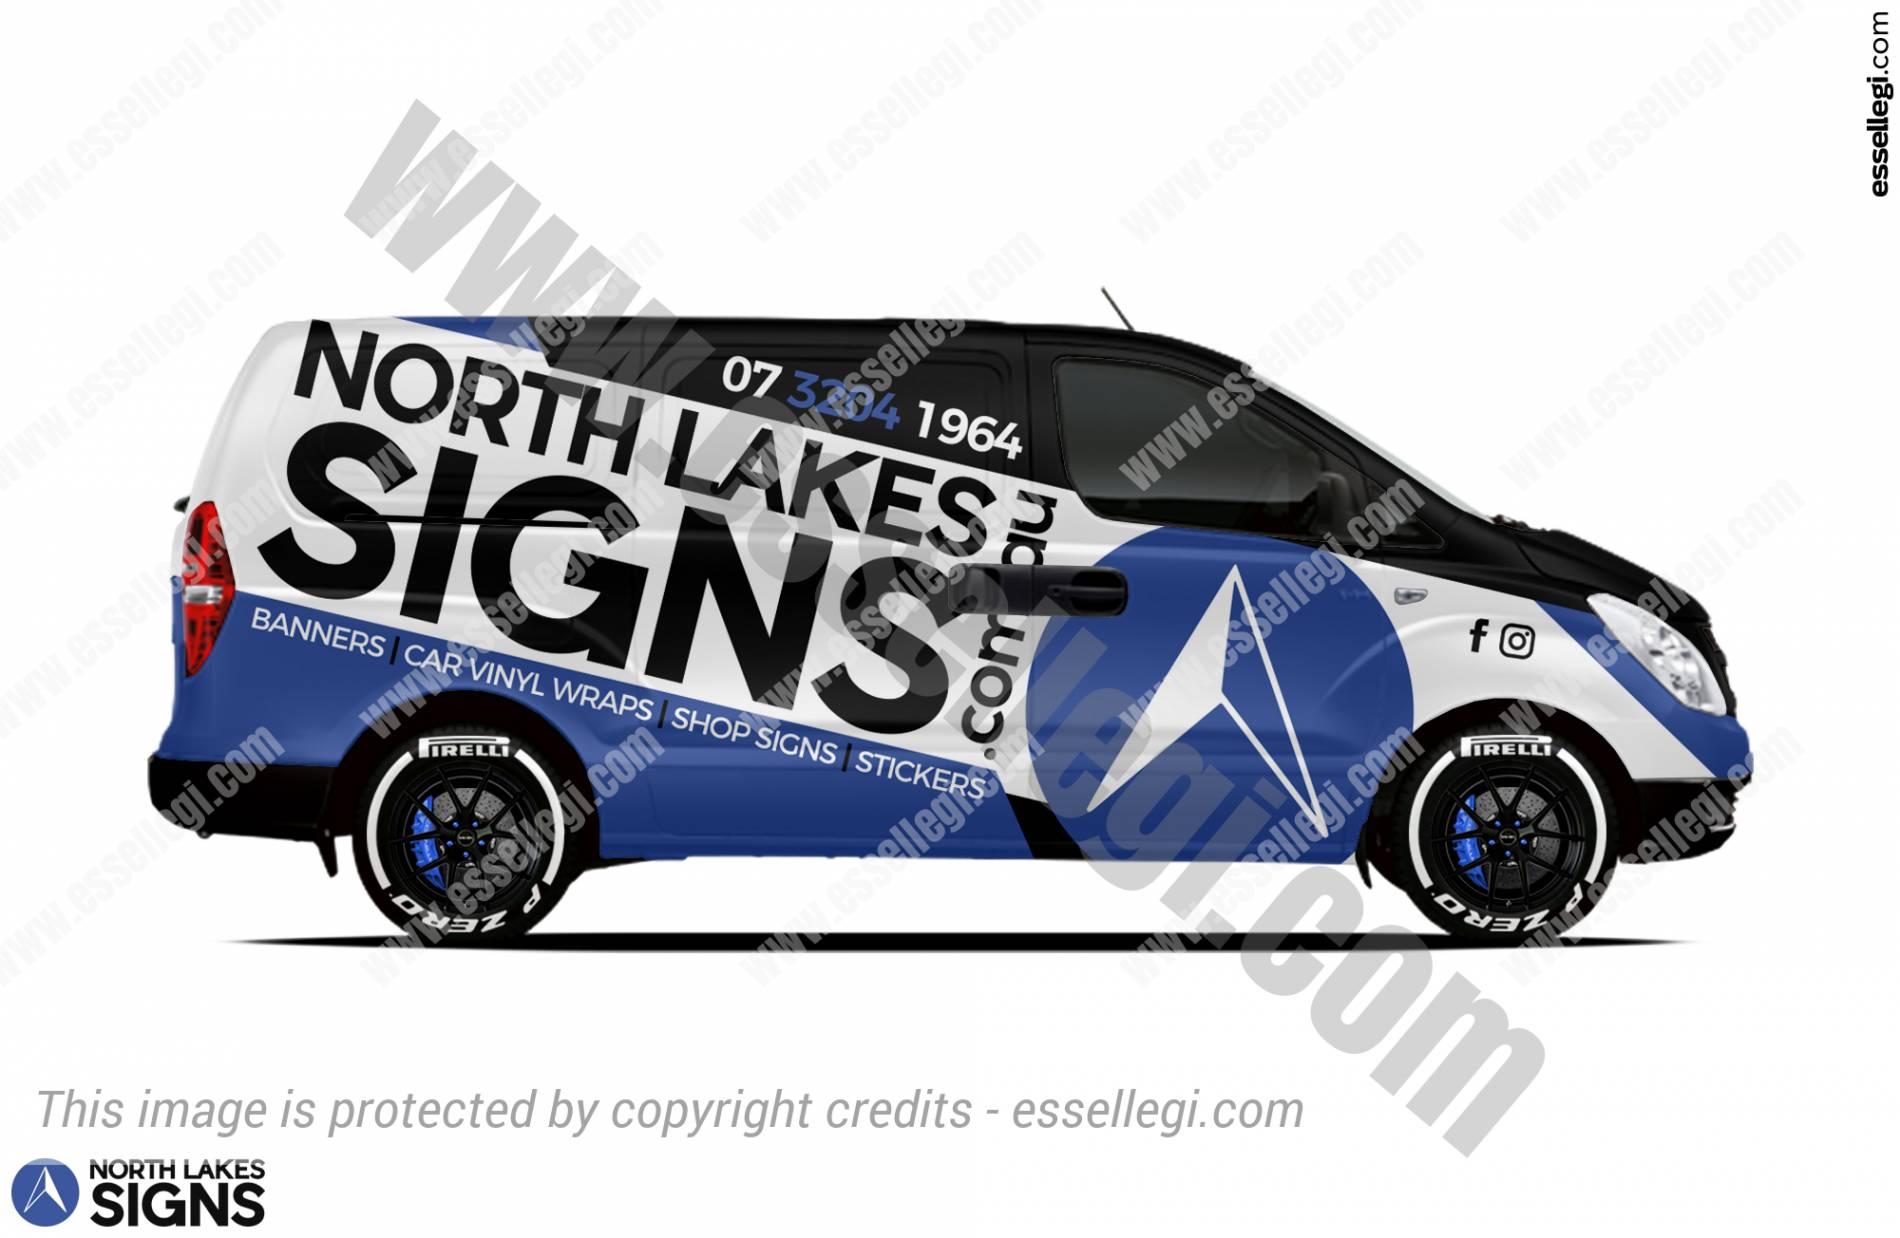 Best Hyundai iLoad Wrap Design for Signs, Signage & Wraps Company